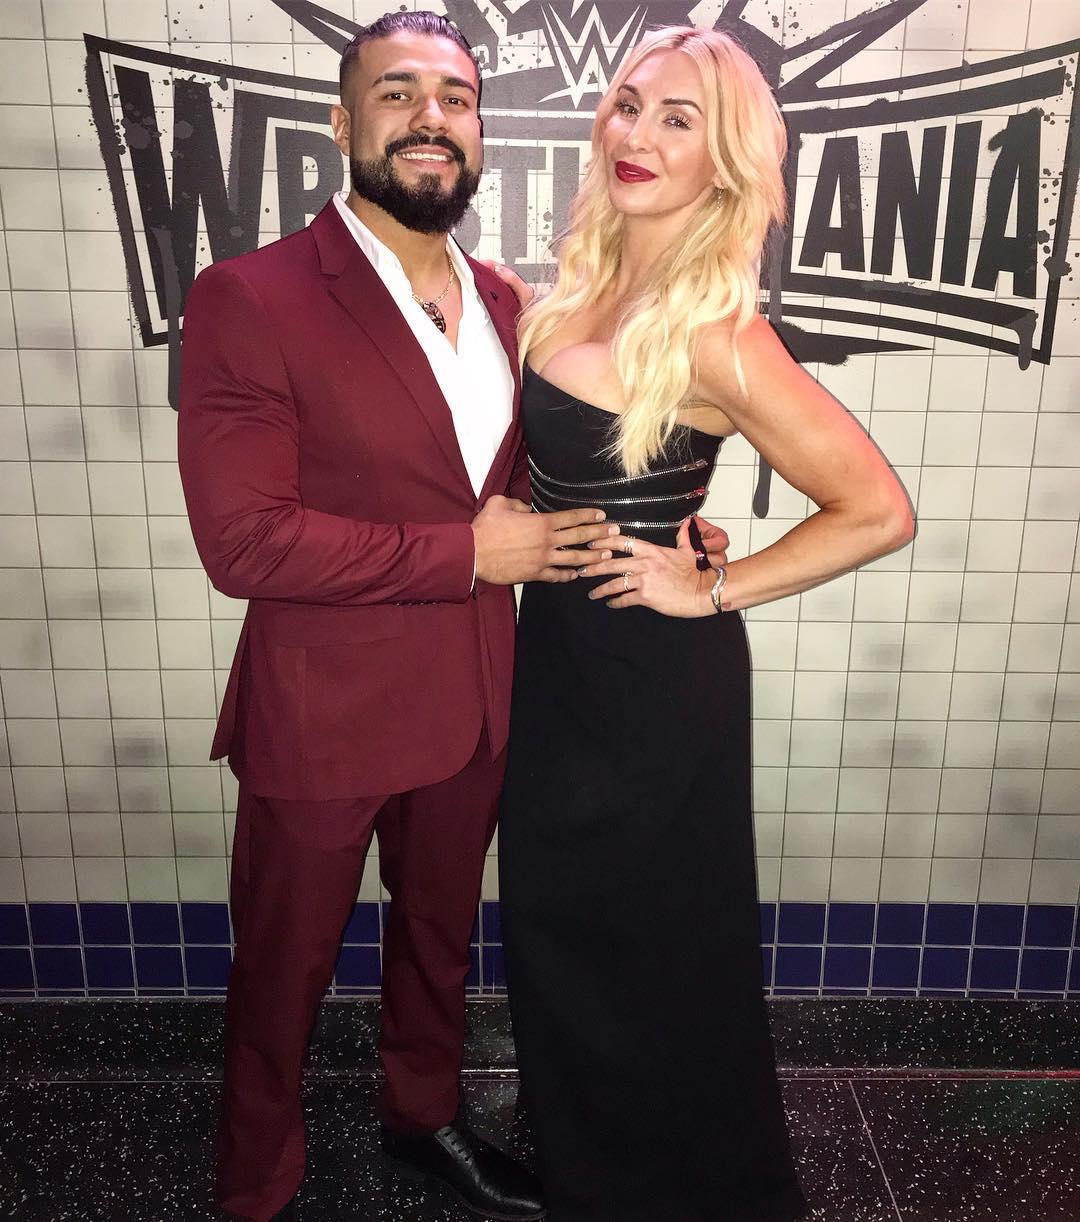 Andrade y Charlotte Flair en New York, New York (05/04/2019) / Instagram.com/CharlotteWWE